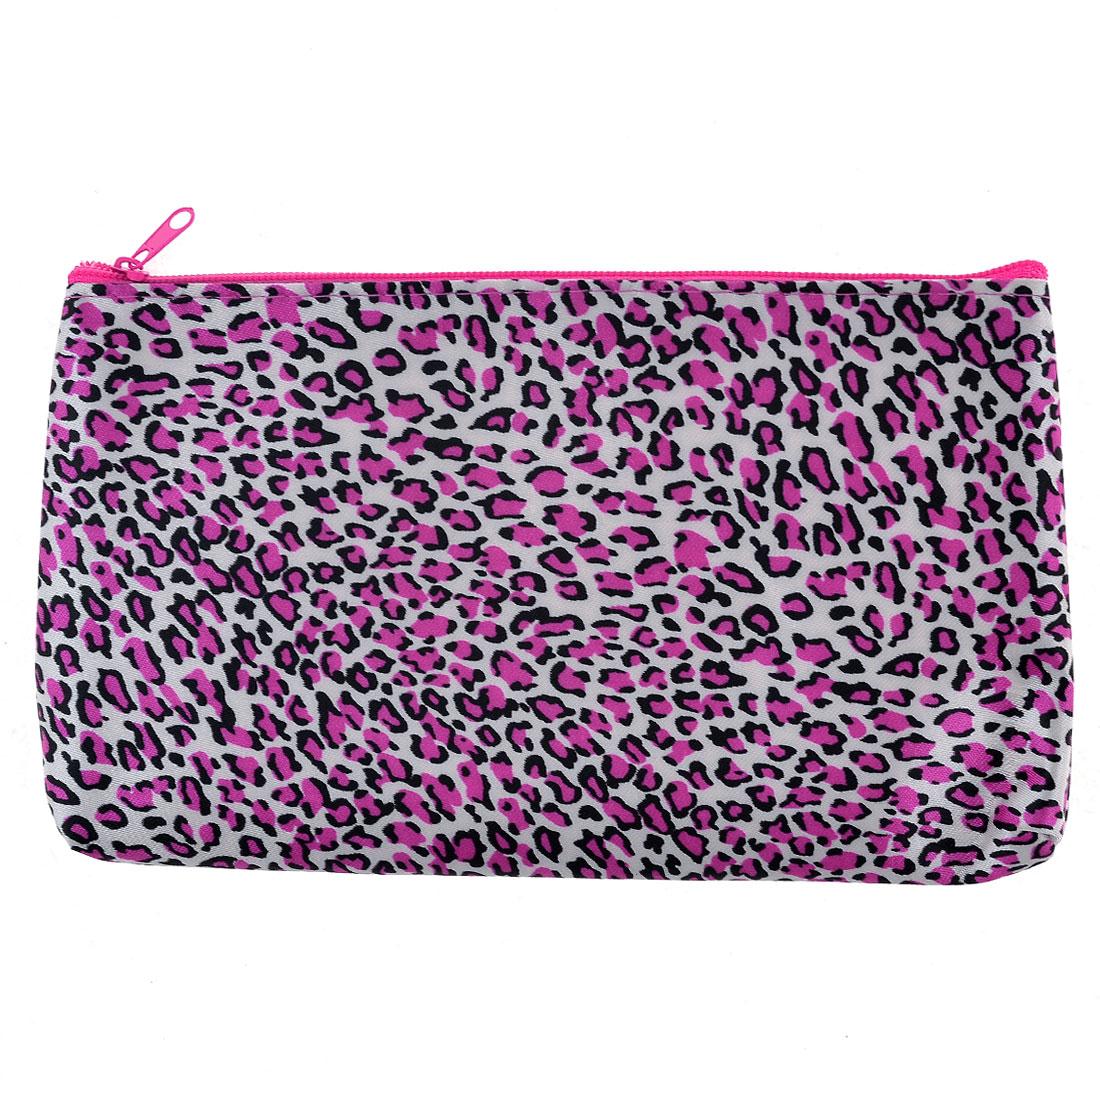 Women Fushcia Leopard Pattern Toiletries Cosmetic Pouch Bag